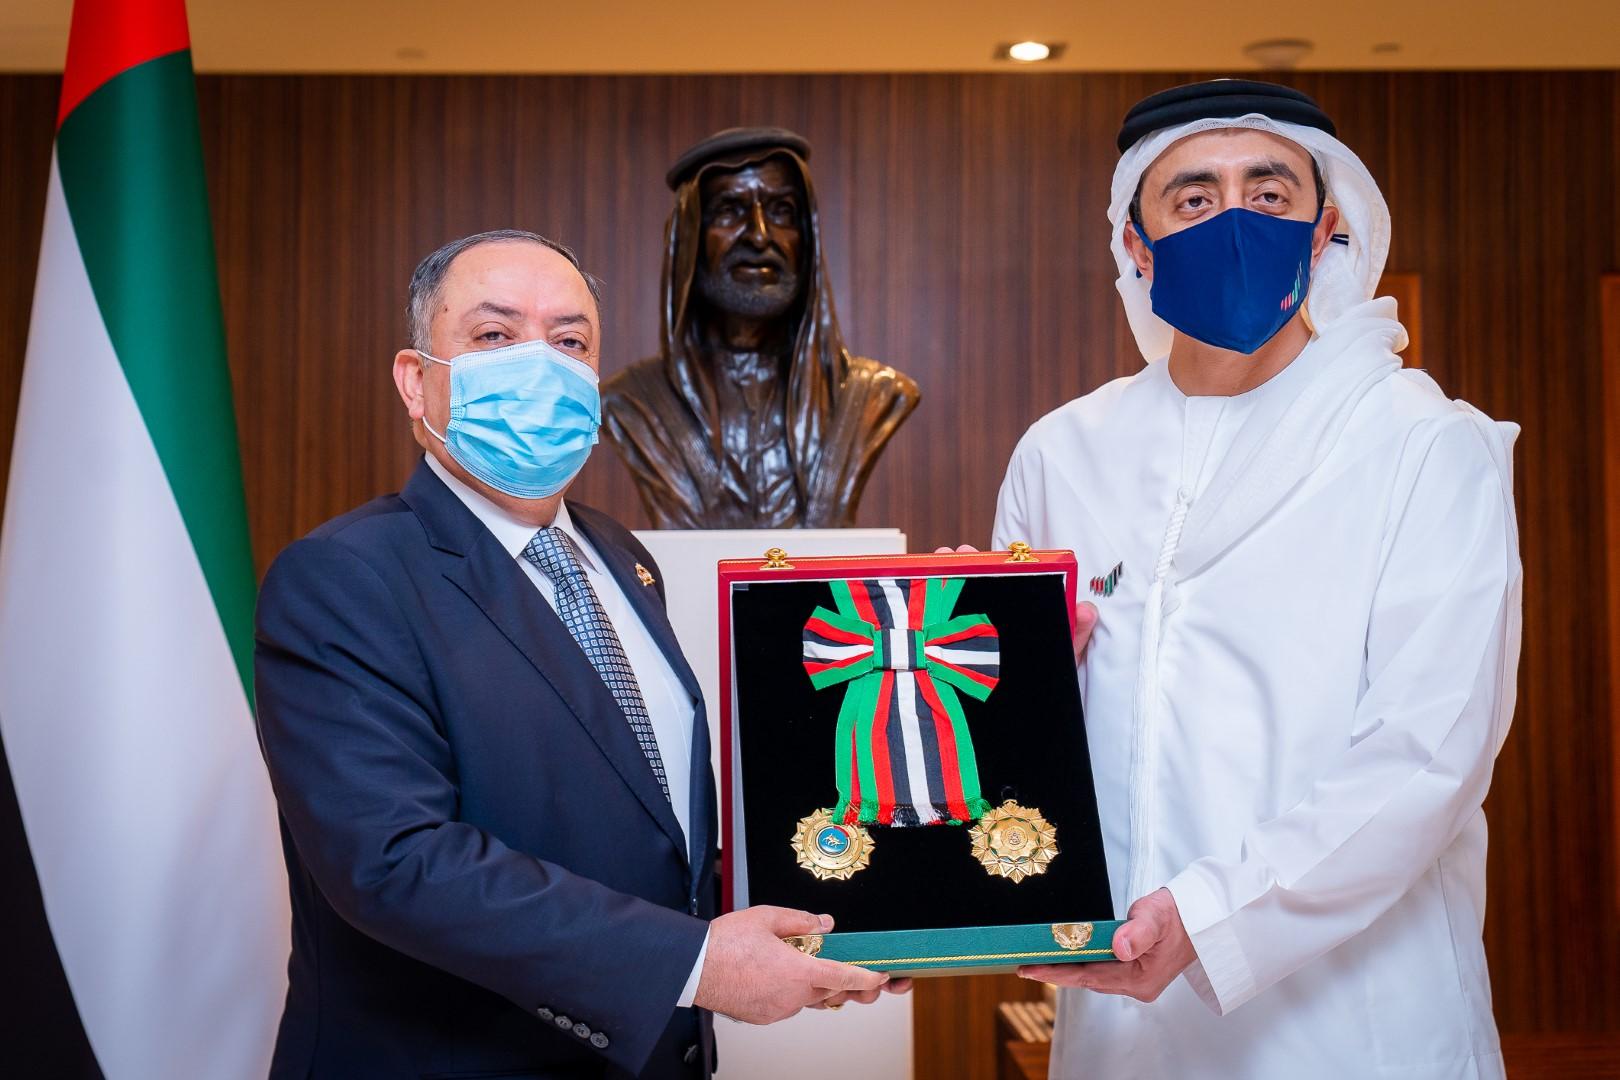 Jordan Ambassador gets prestigious UAE honor